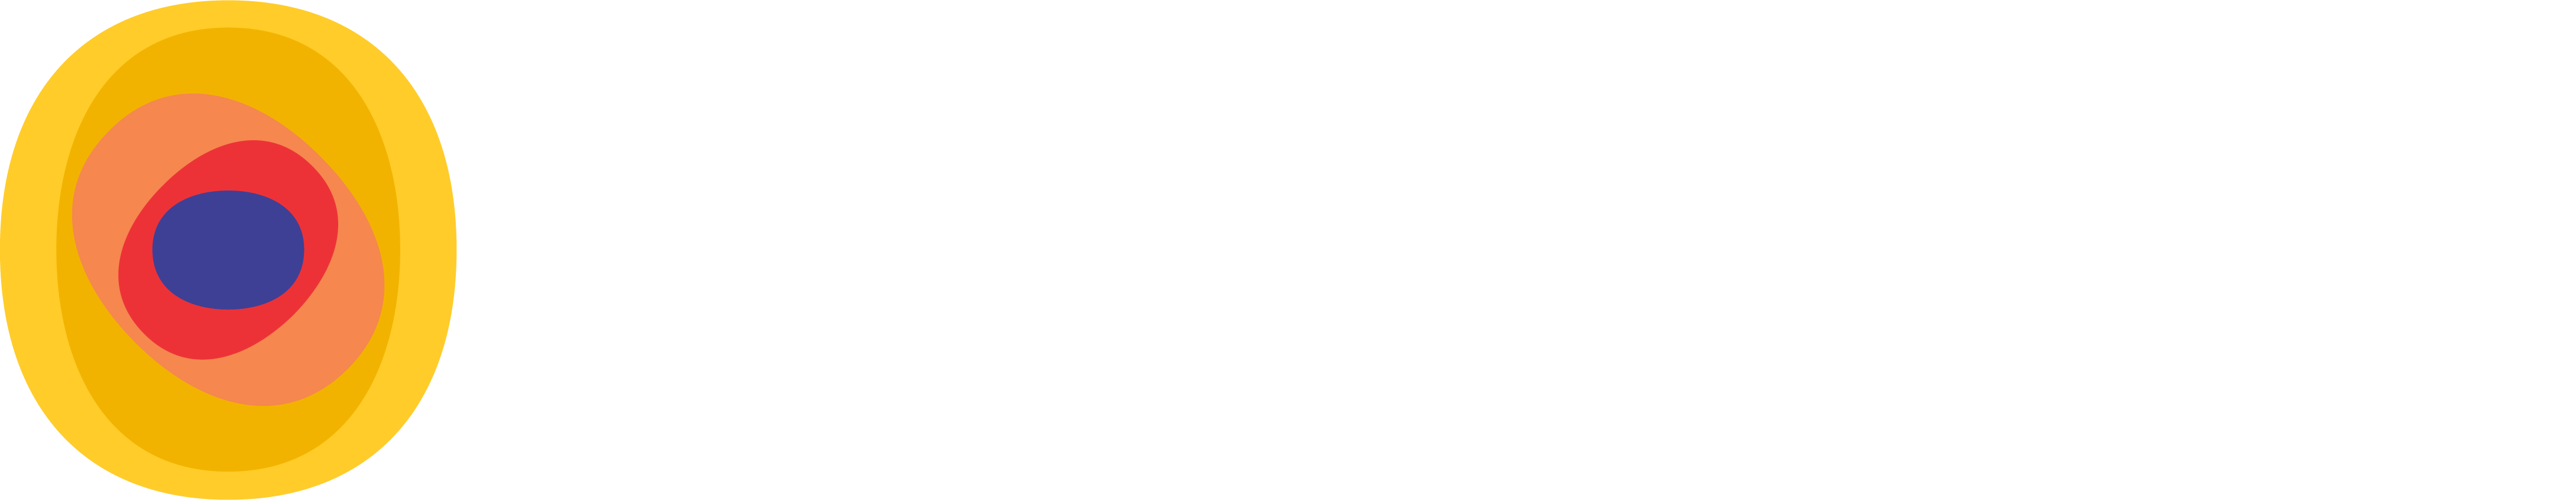 Oando Foundation Logo White Alt